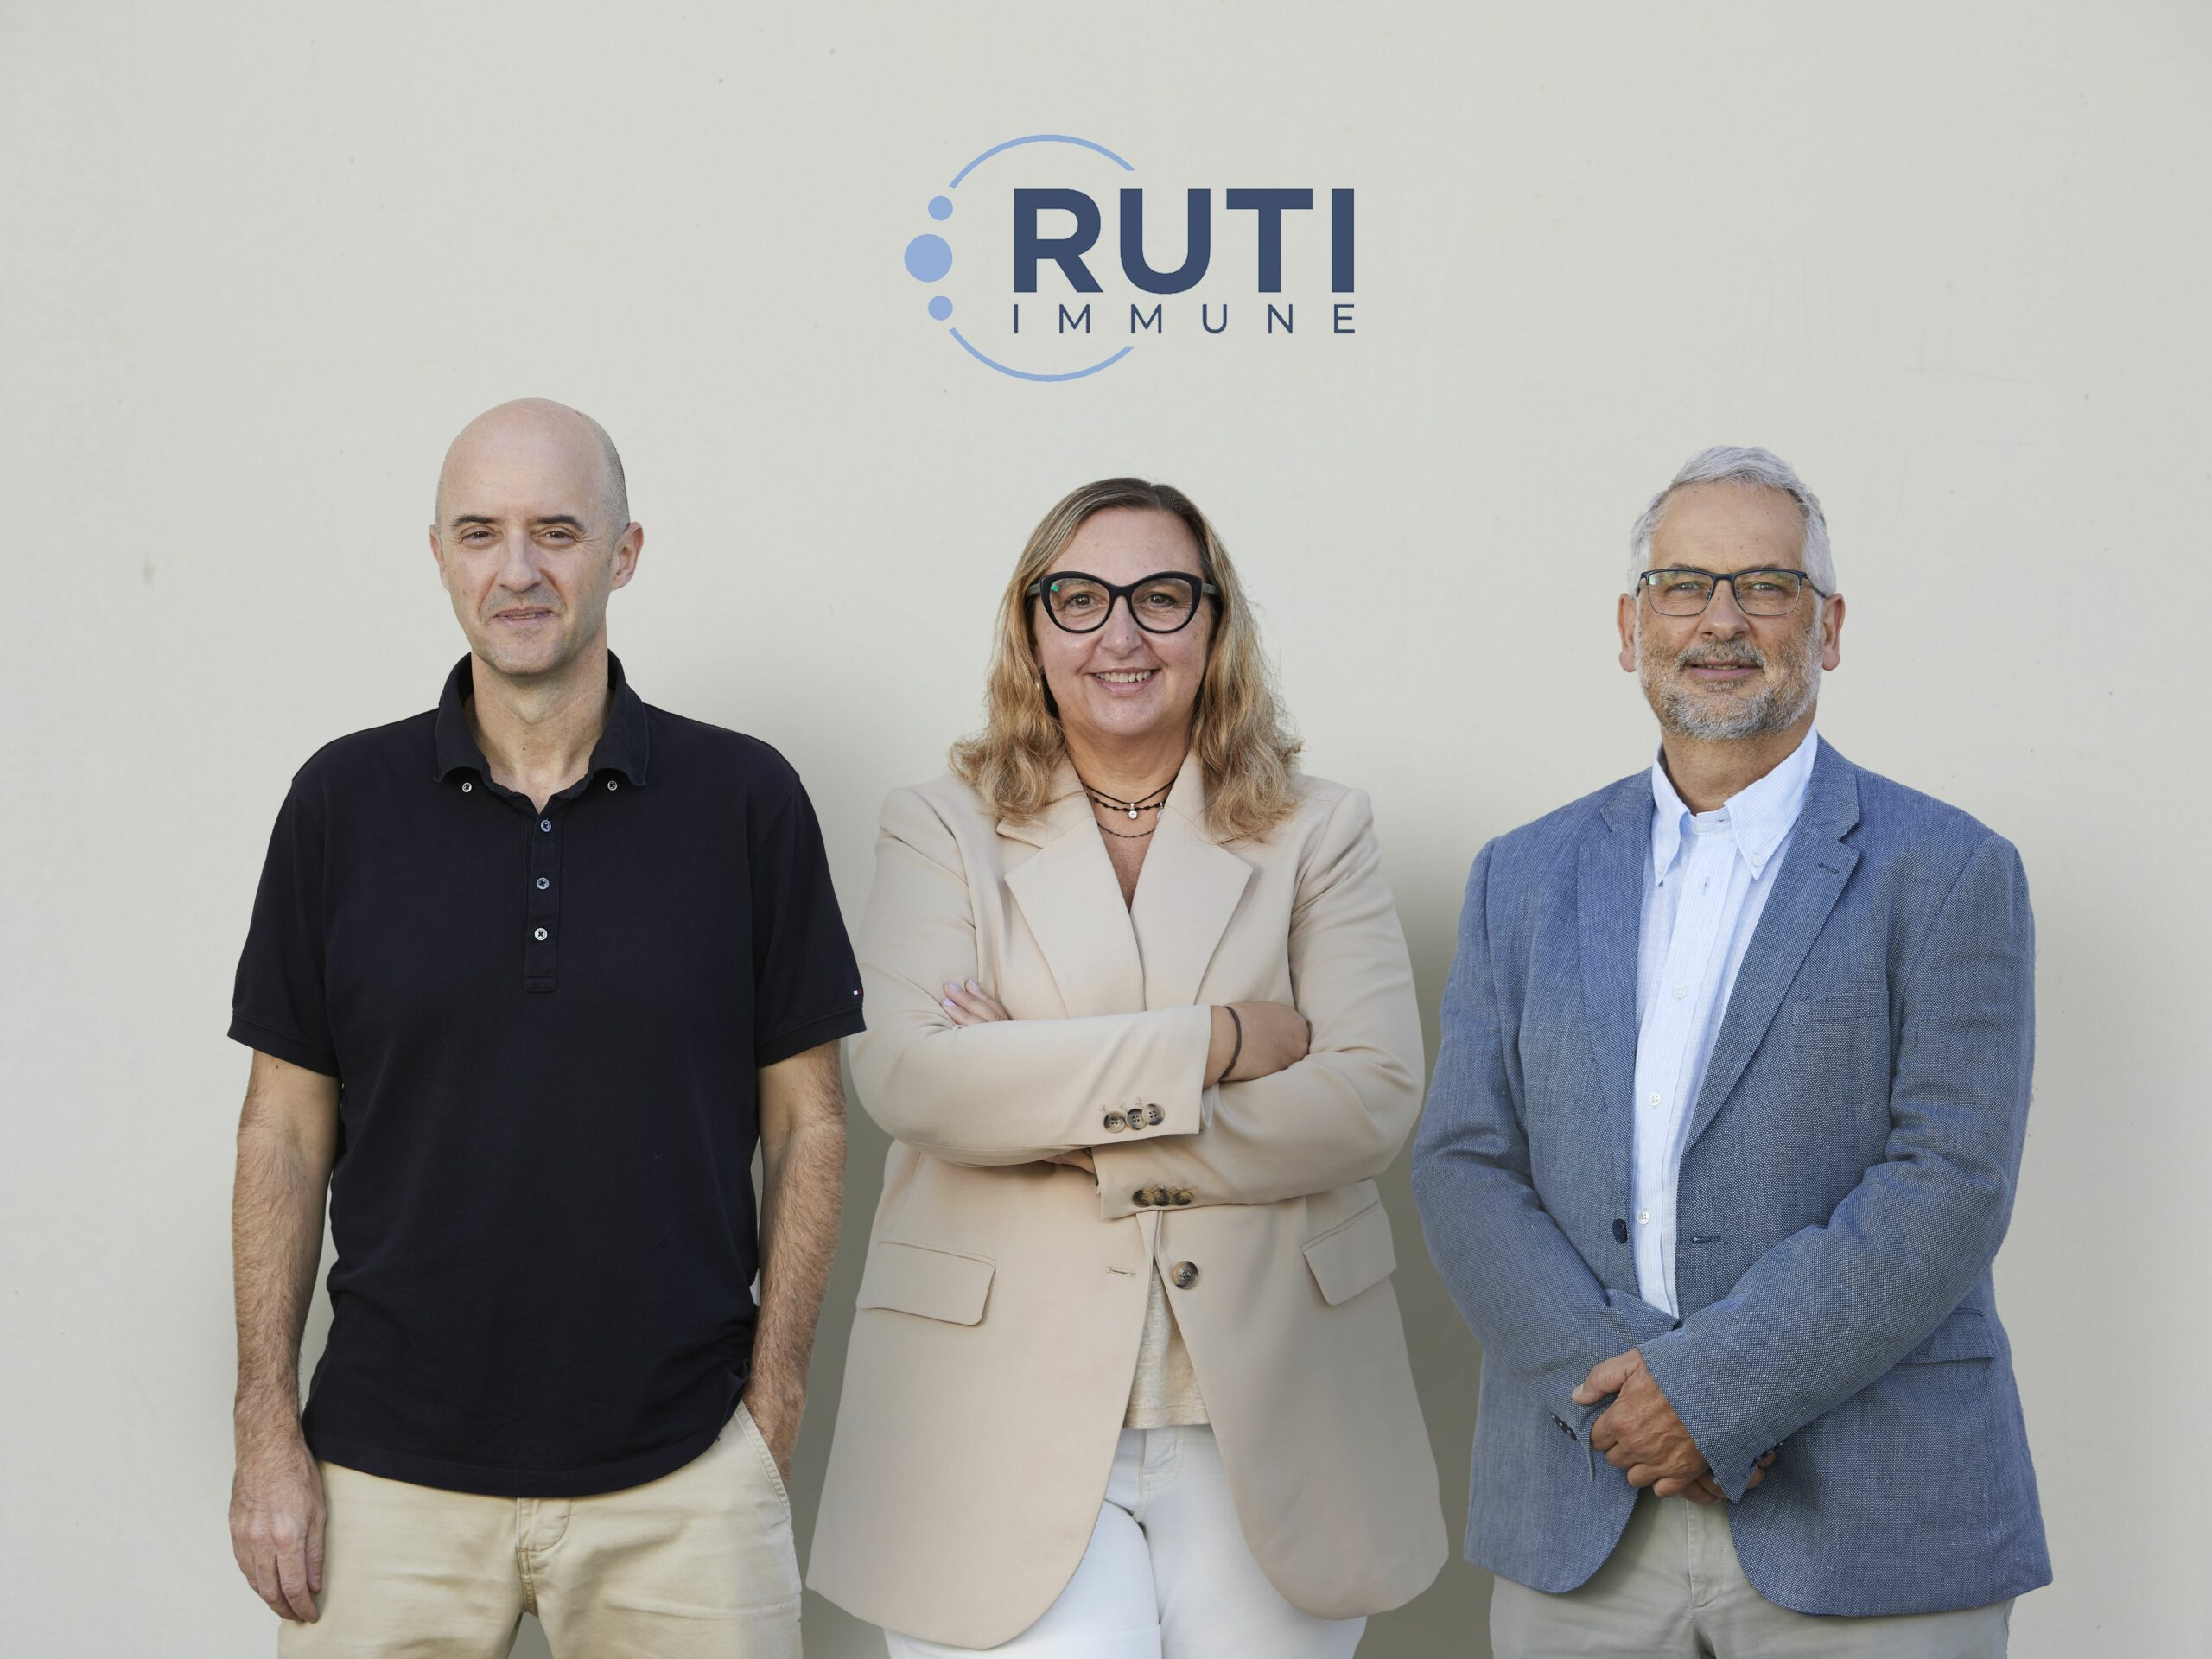 Foto equip RUTI Immune